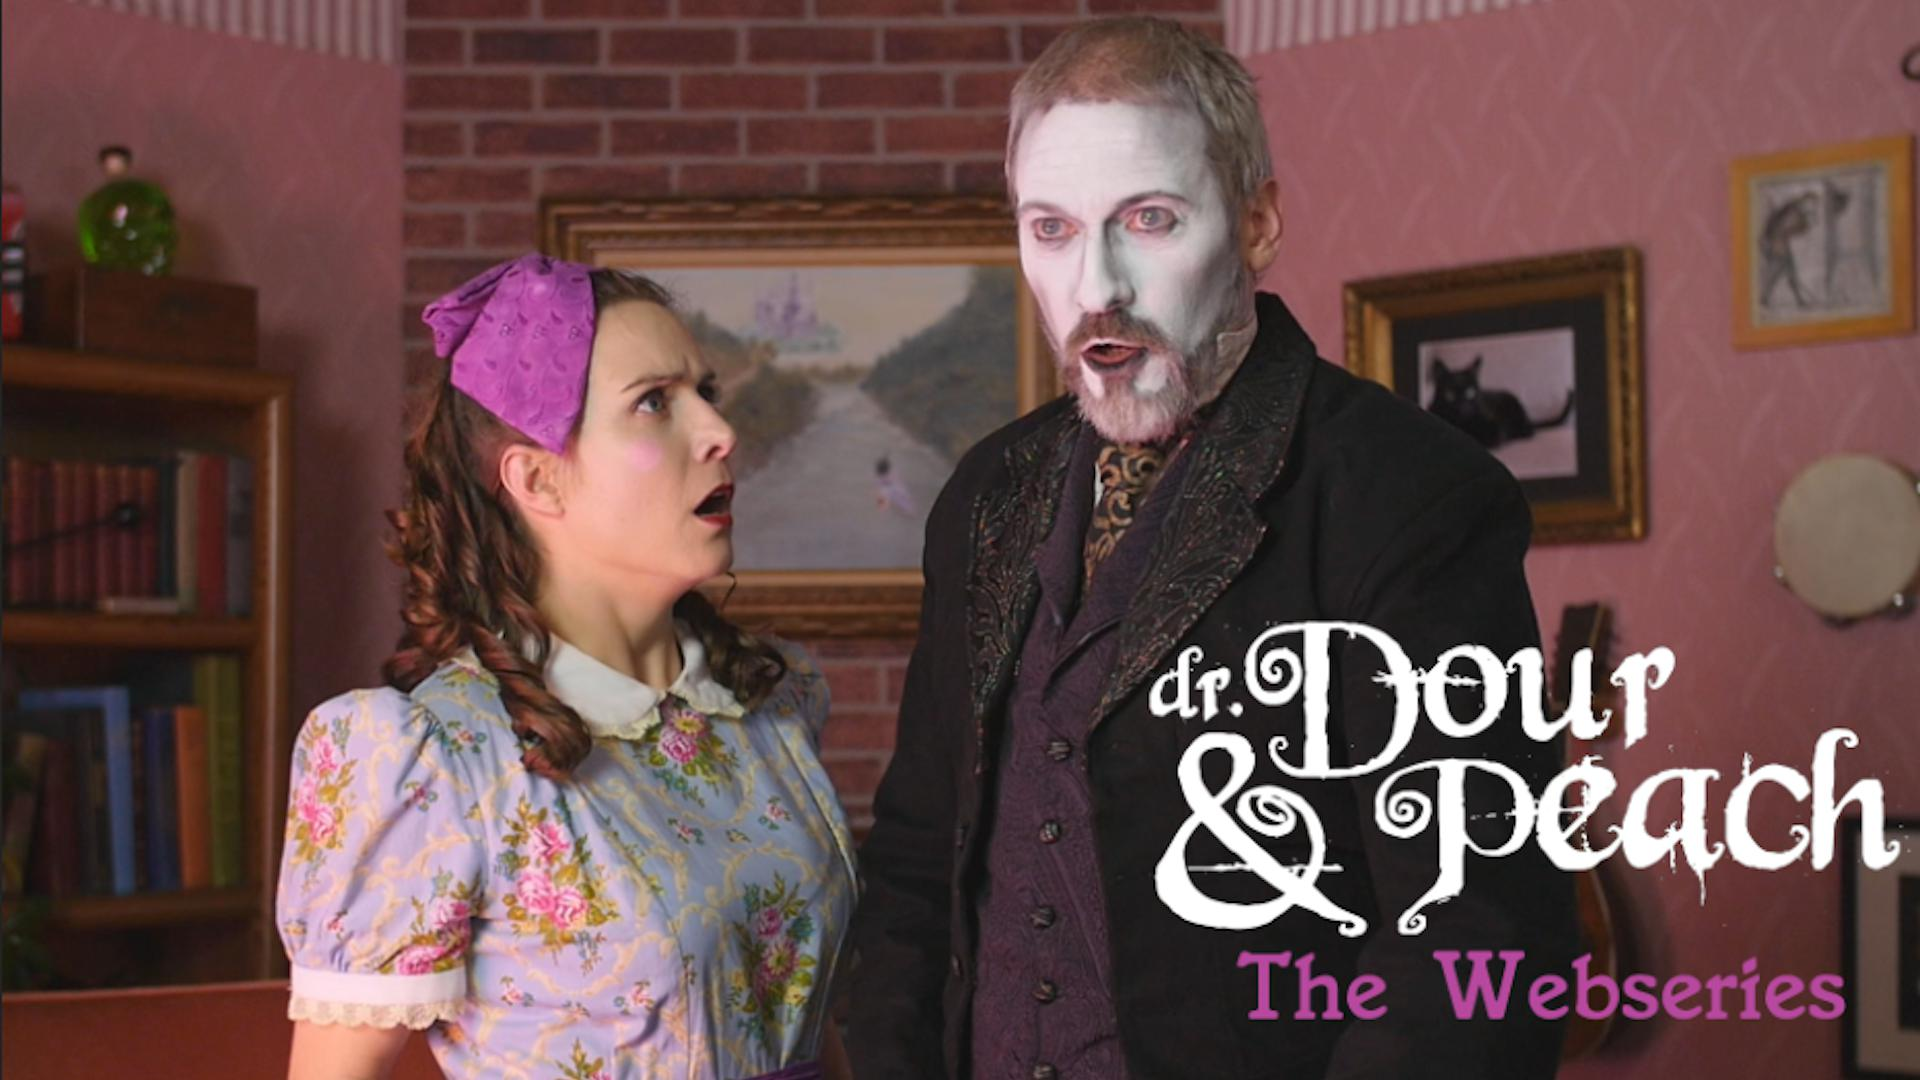 Dr. Dour & Peach: The Webseries (episodes 1 - 3)